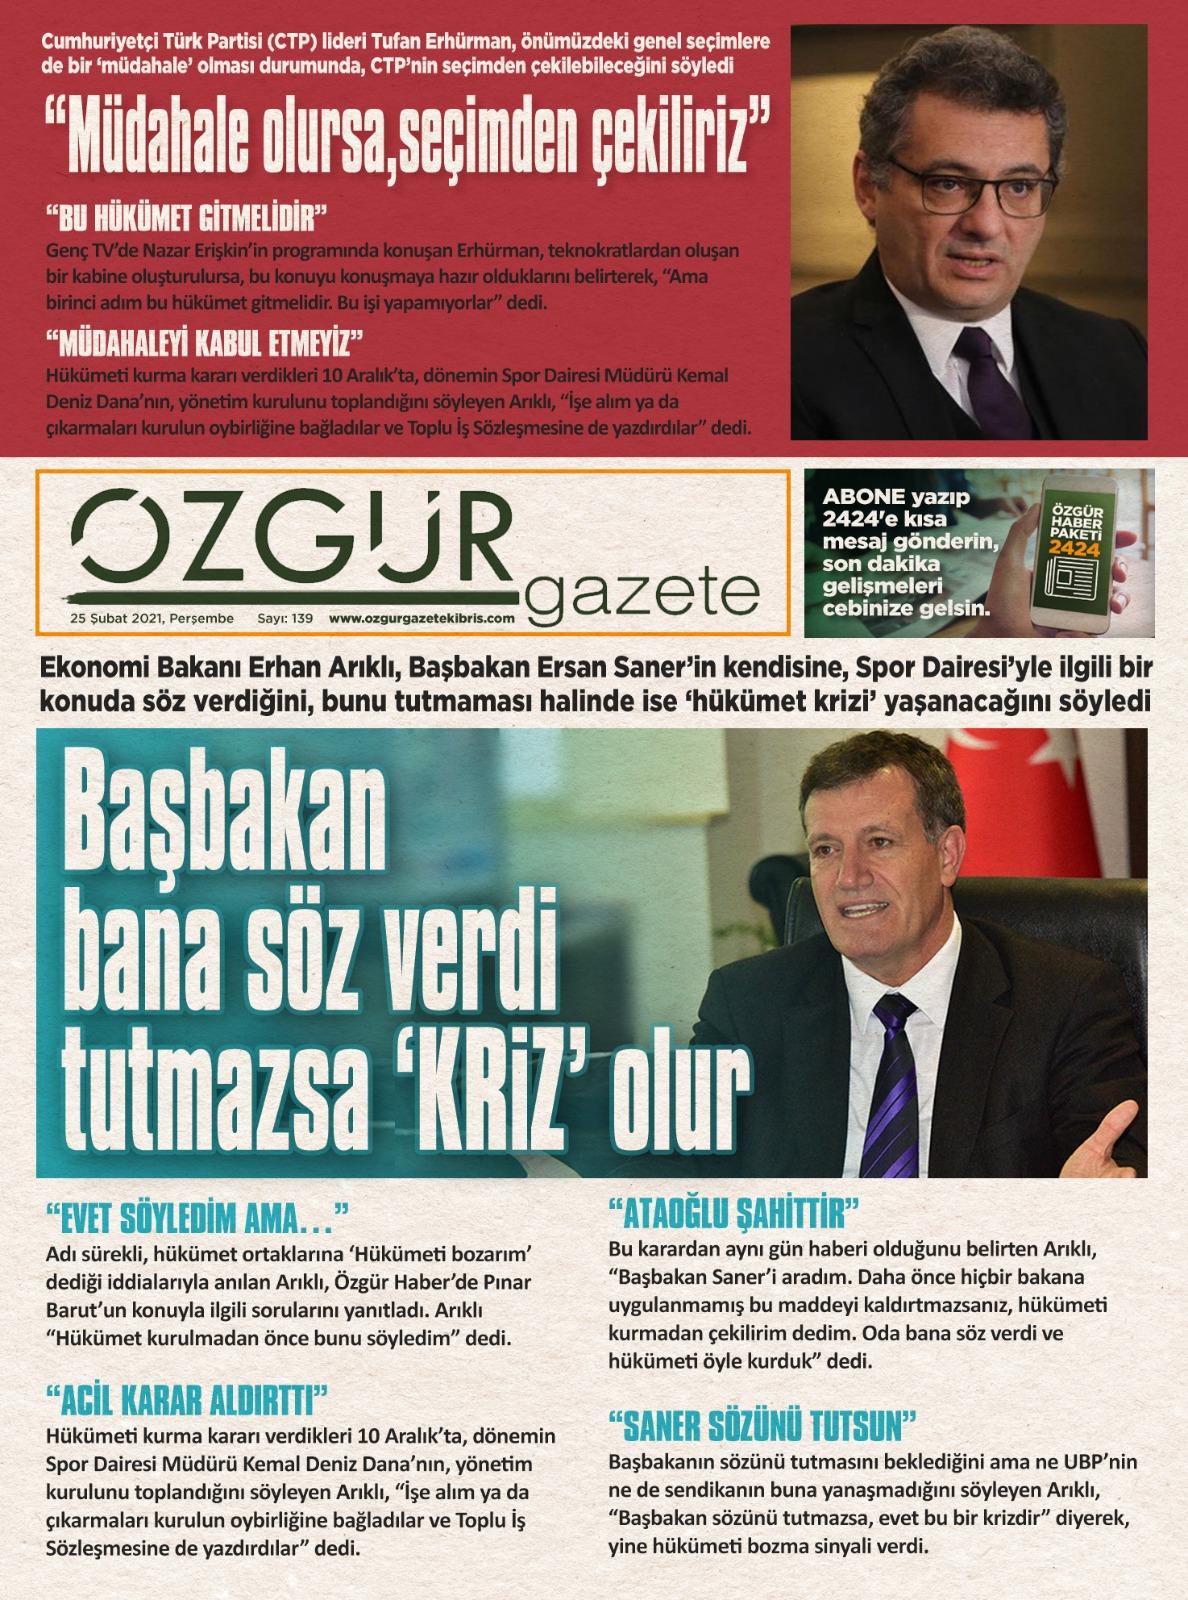 ozgur_gazete_kibris_manset